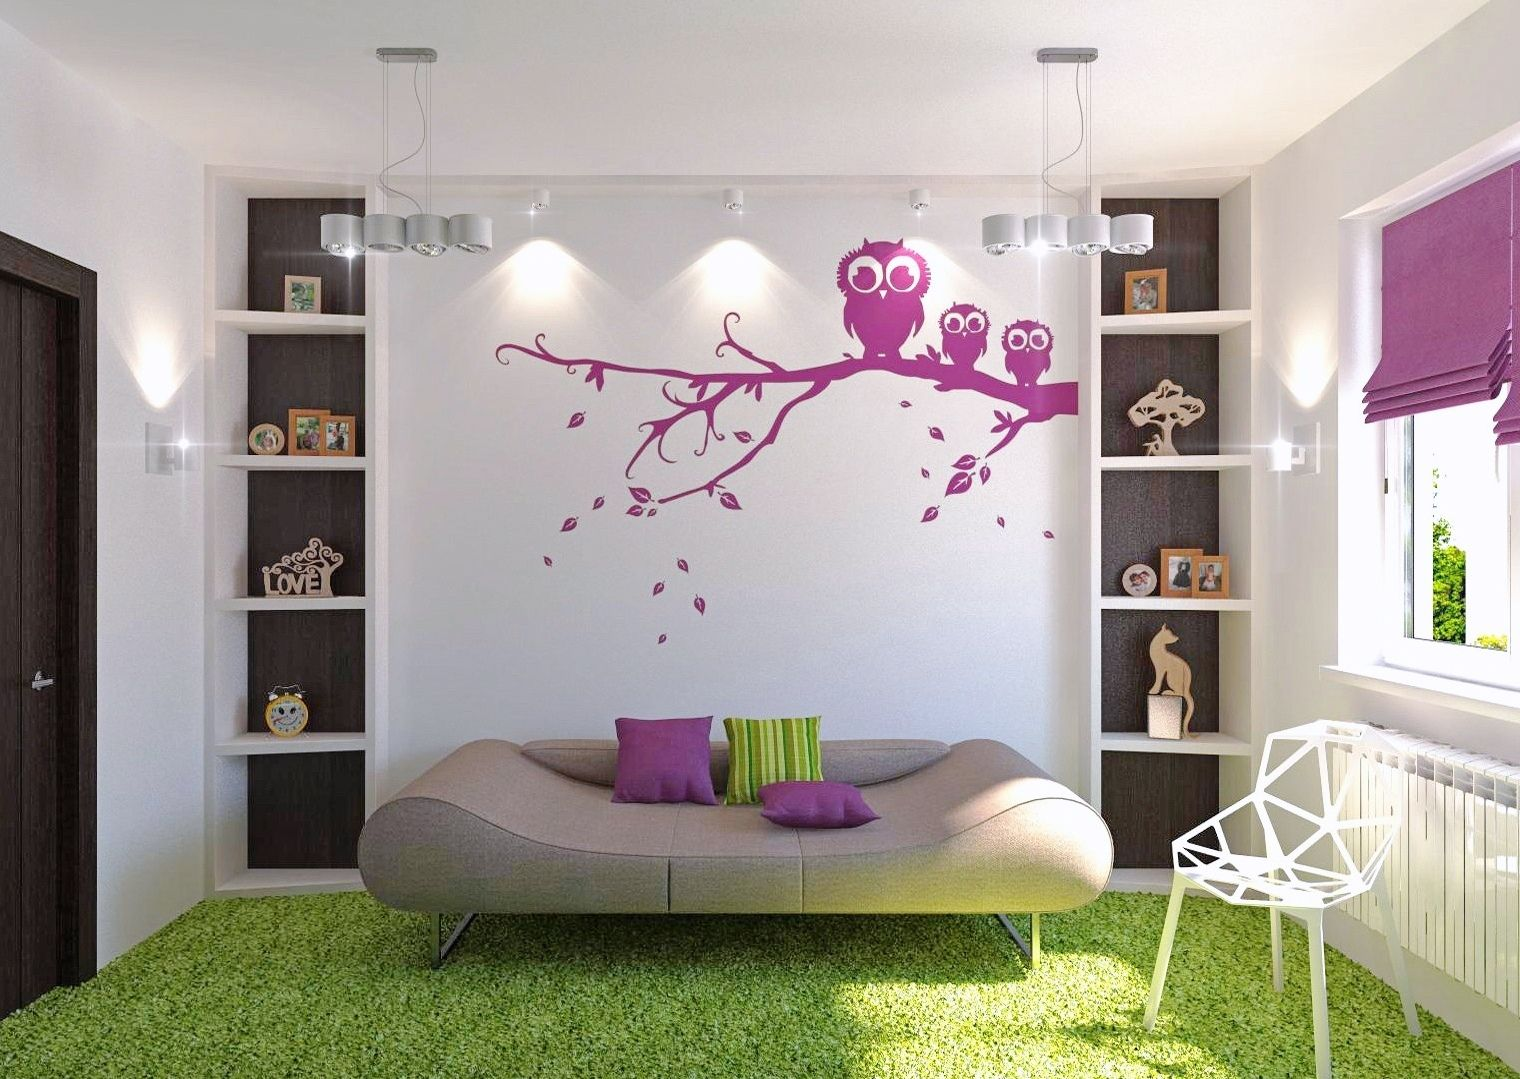 Bedroom Designs For Adults Portrait Of Bedroom Ideas For Young Adults  Bedroom Design